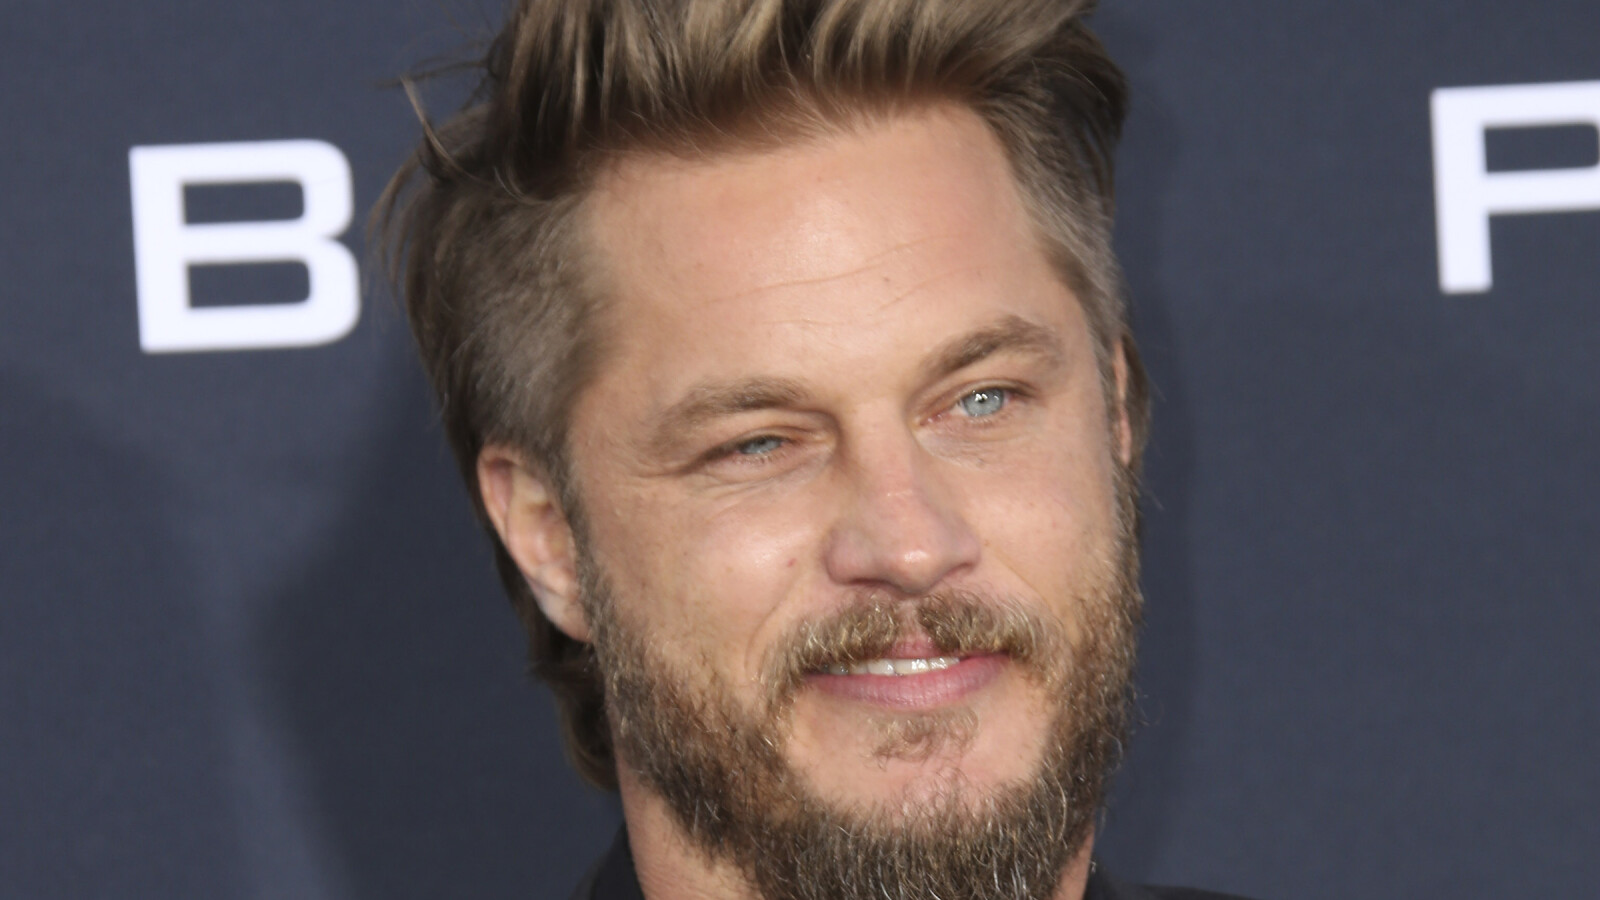 Ragnar frisur